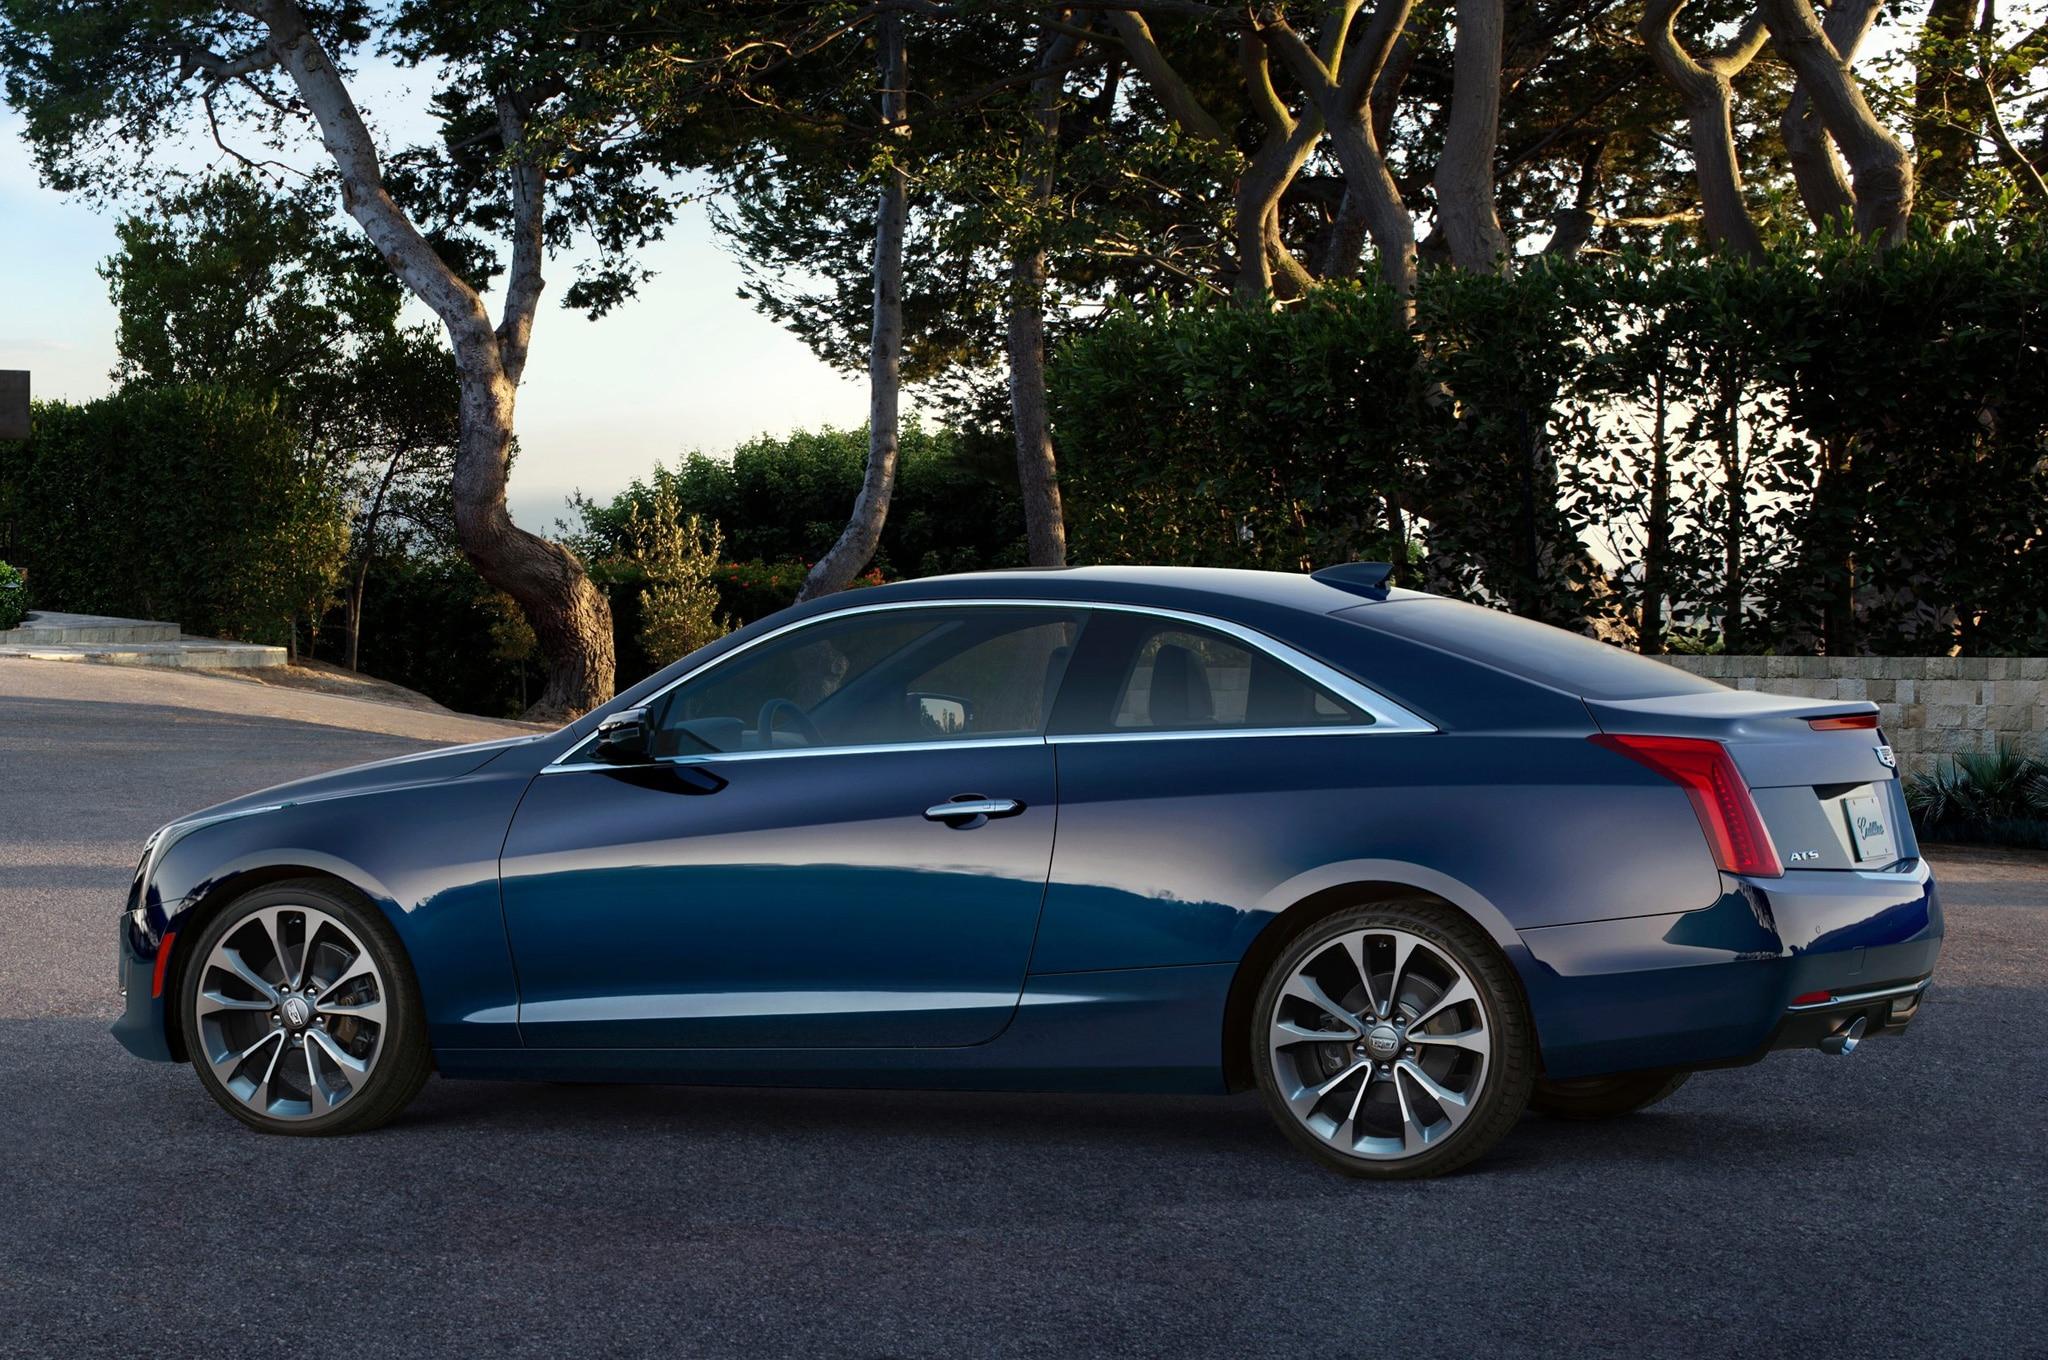 2015 Cadillac ATS Coupe Priced at $38,990